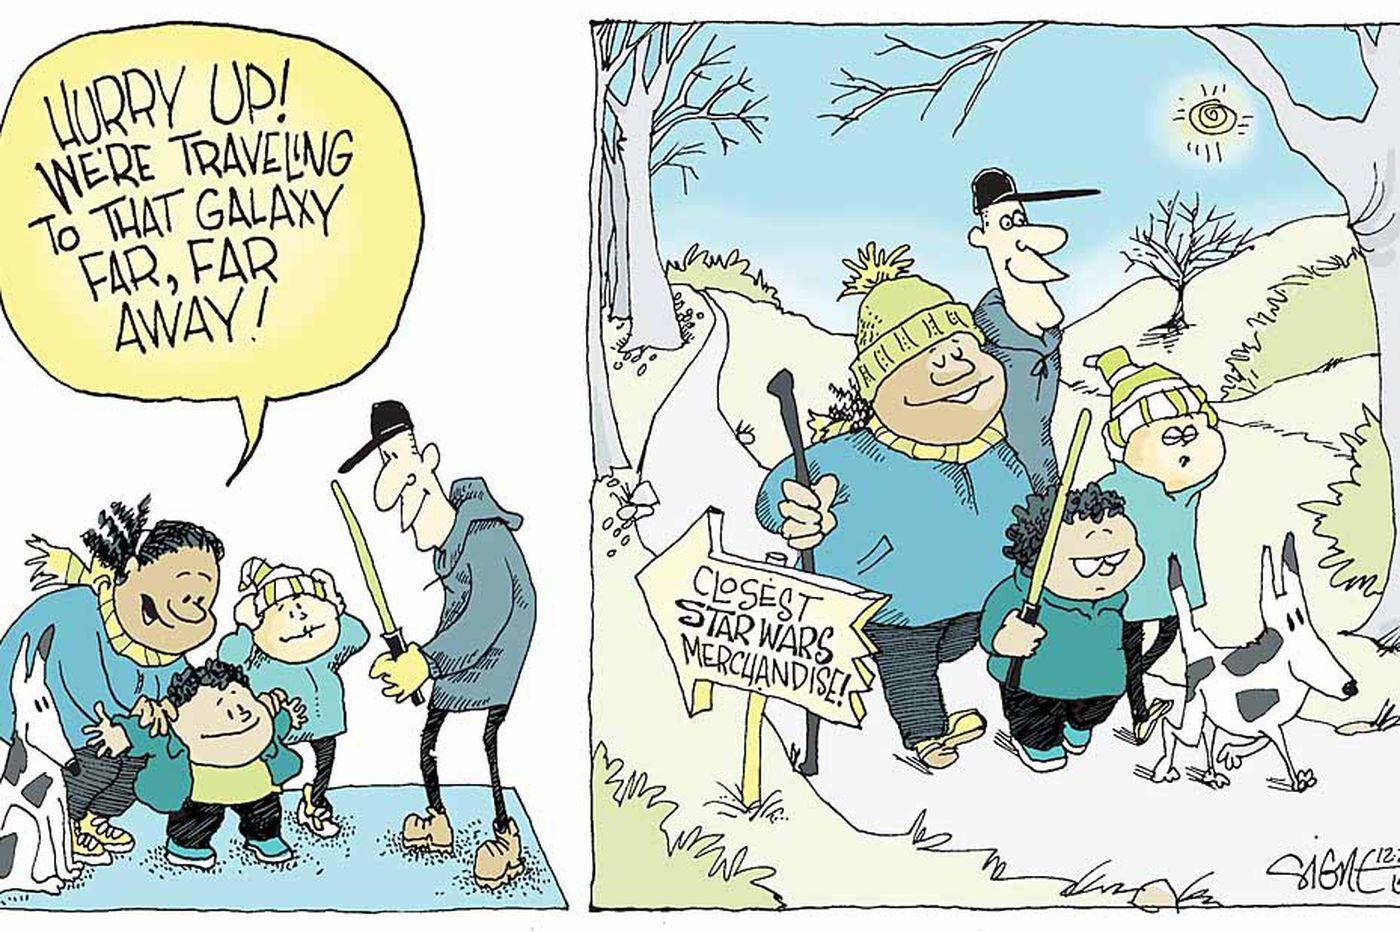 Daily Signe Cartoon 12/20/15